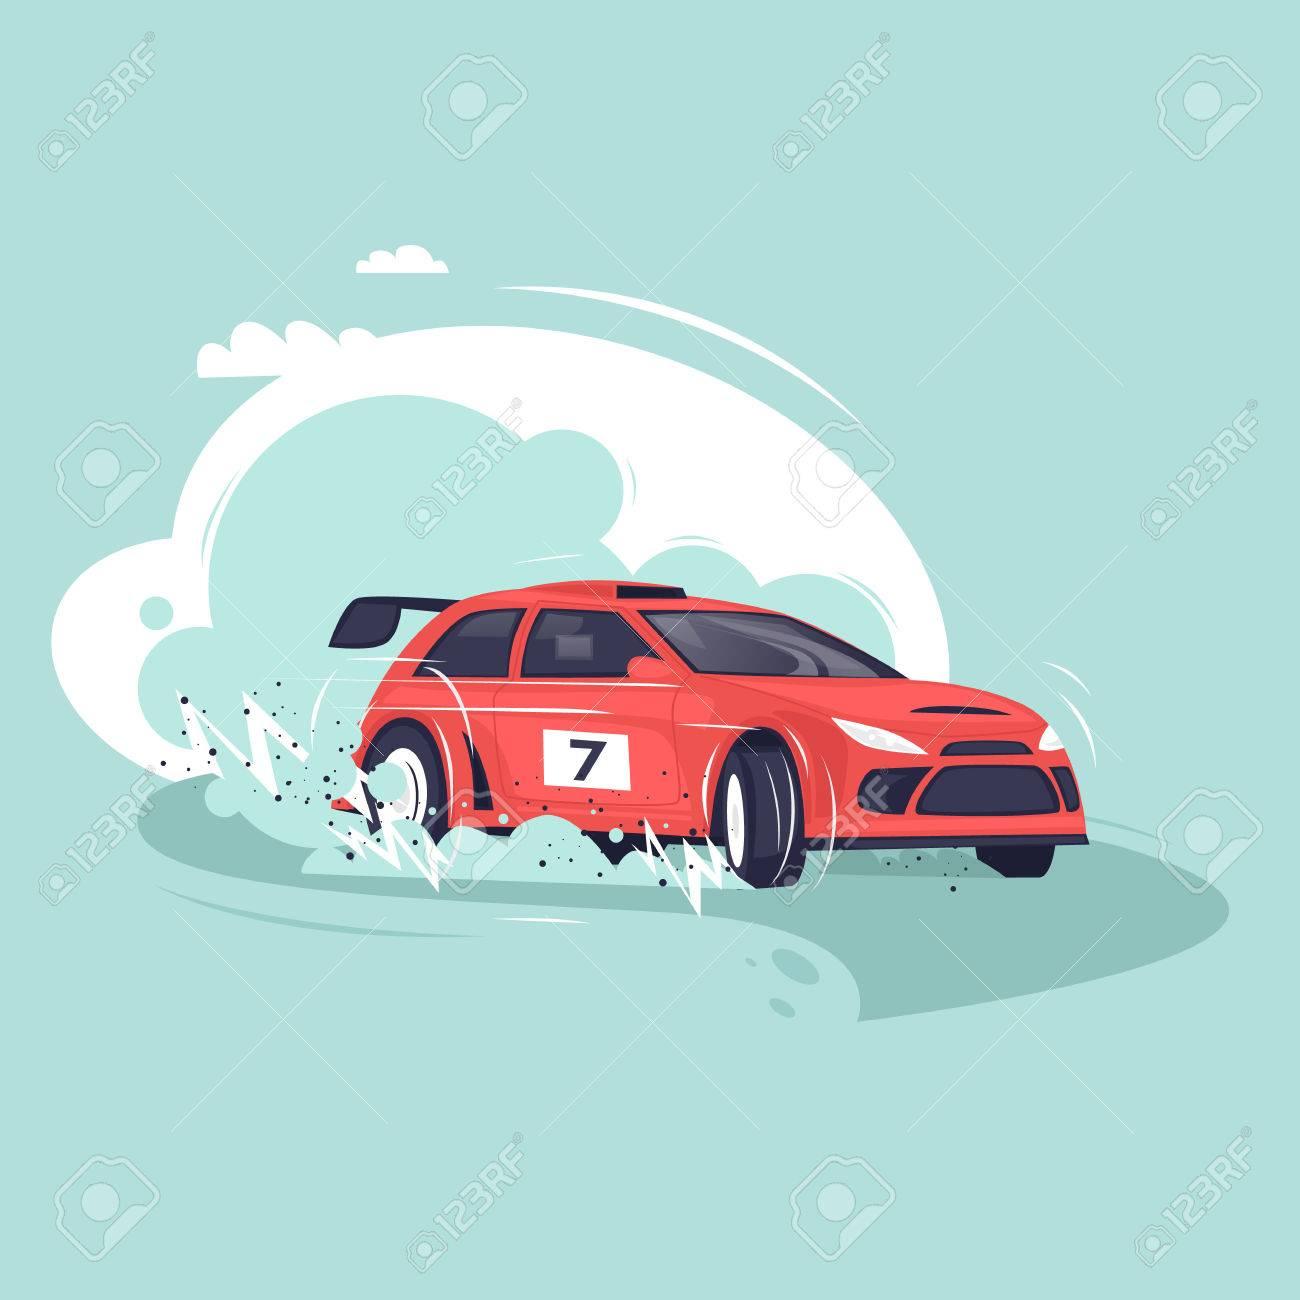 Rally car. Flat vector illustration in cartoon style. - 70872101